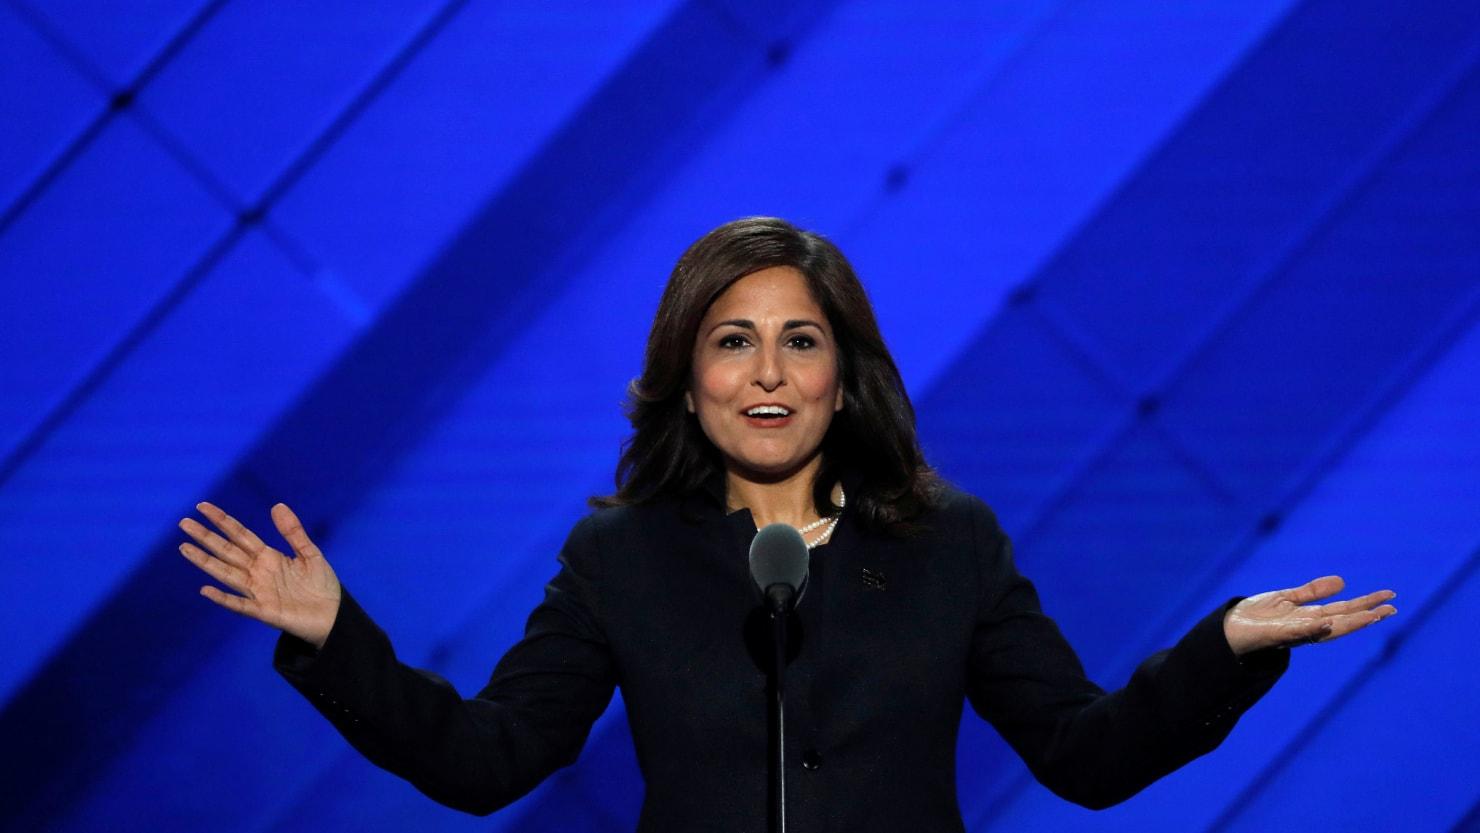 Neera Tanden Mean-Tweeted GOP Lawmakers—Until She Needed Their Votes